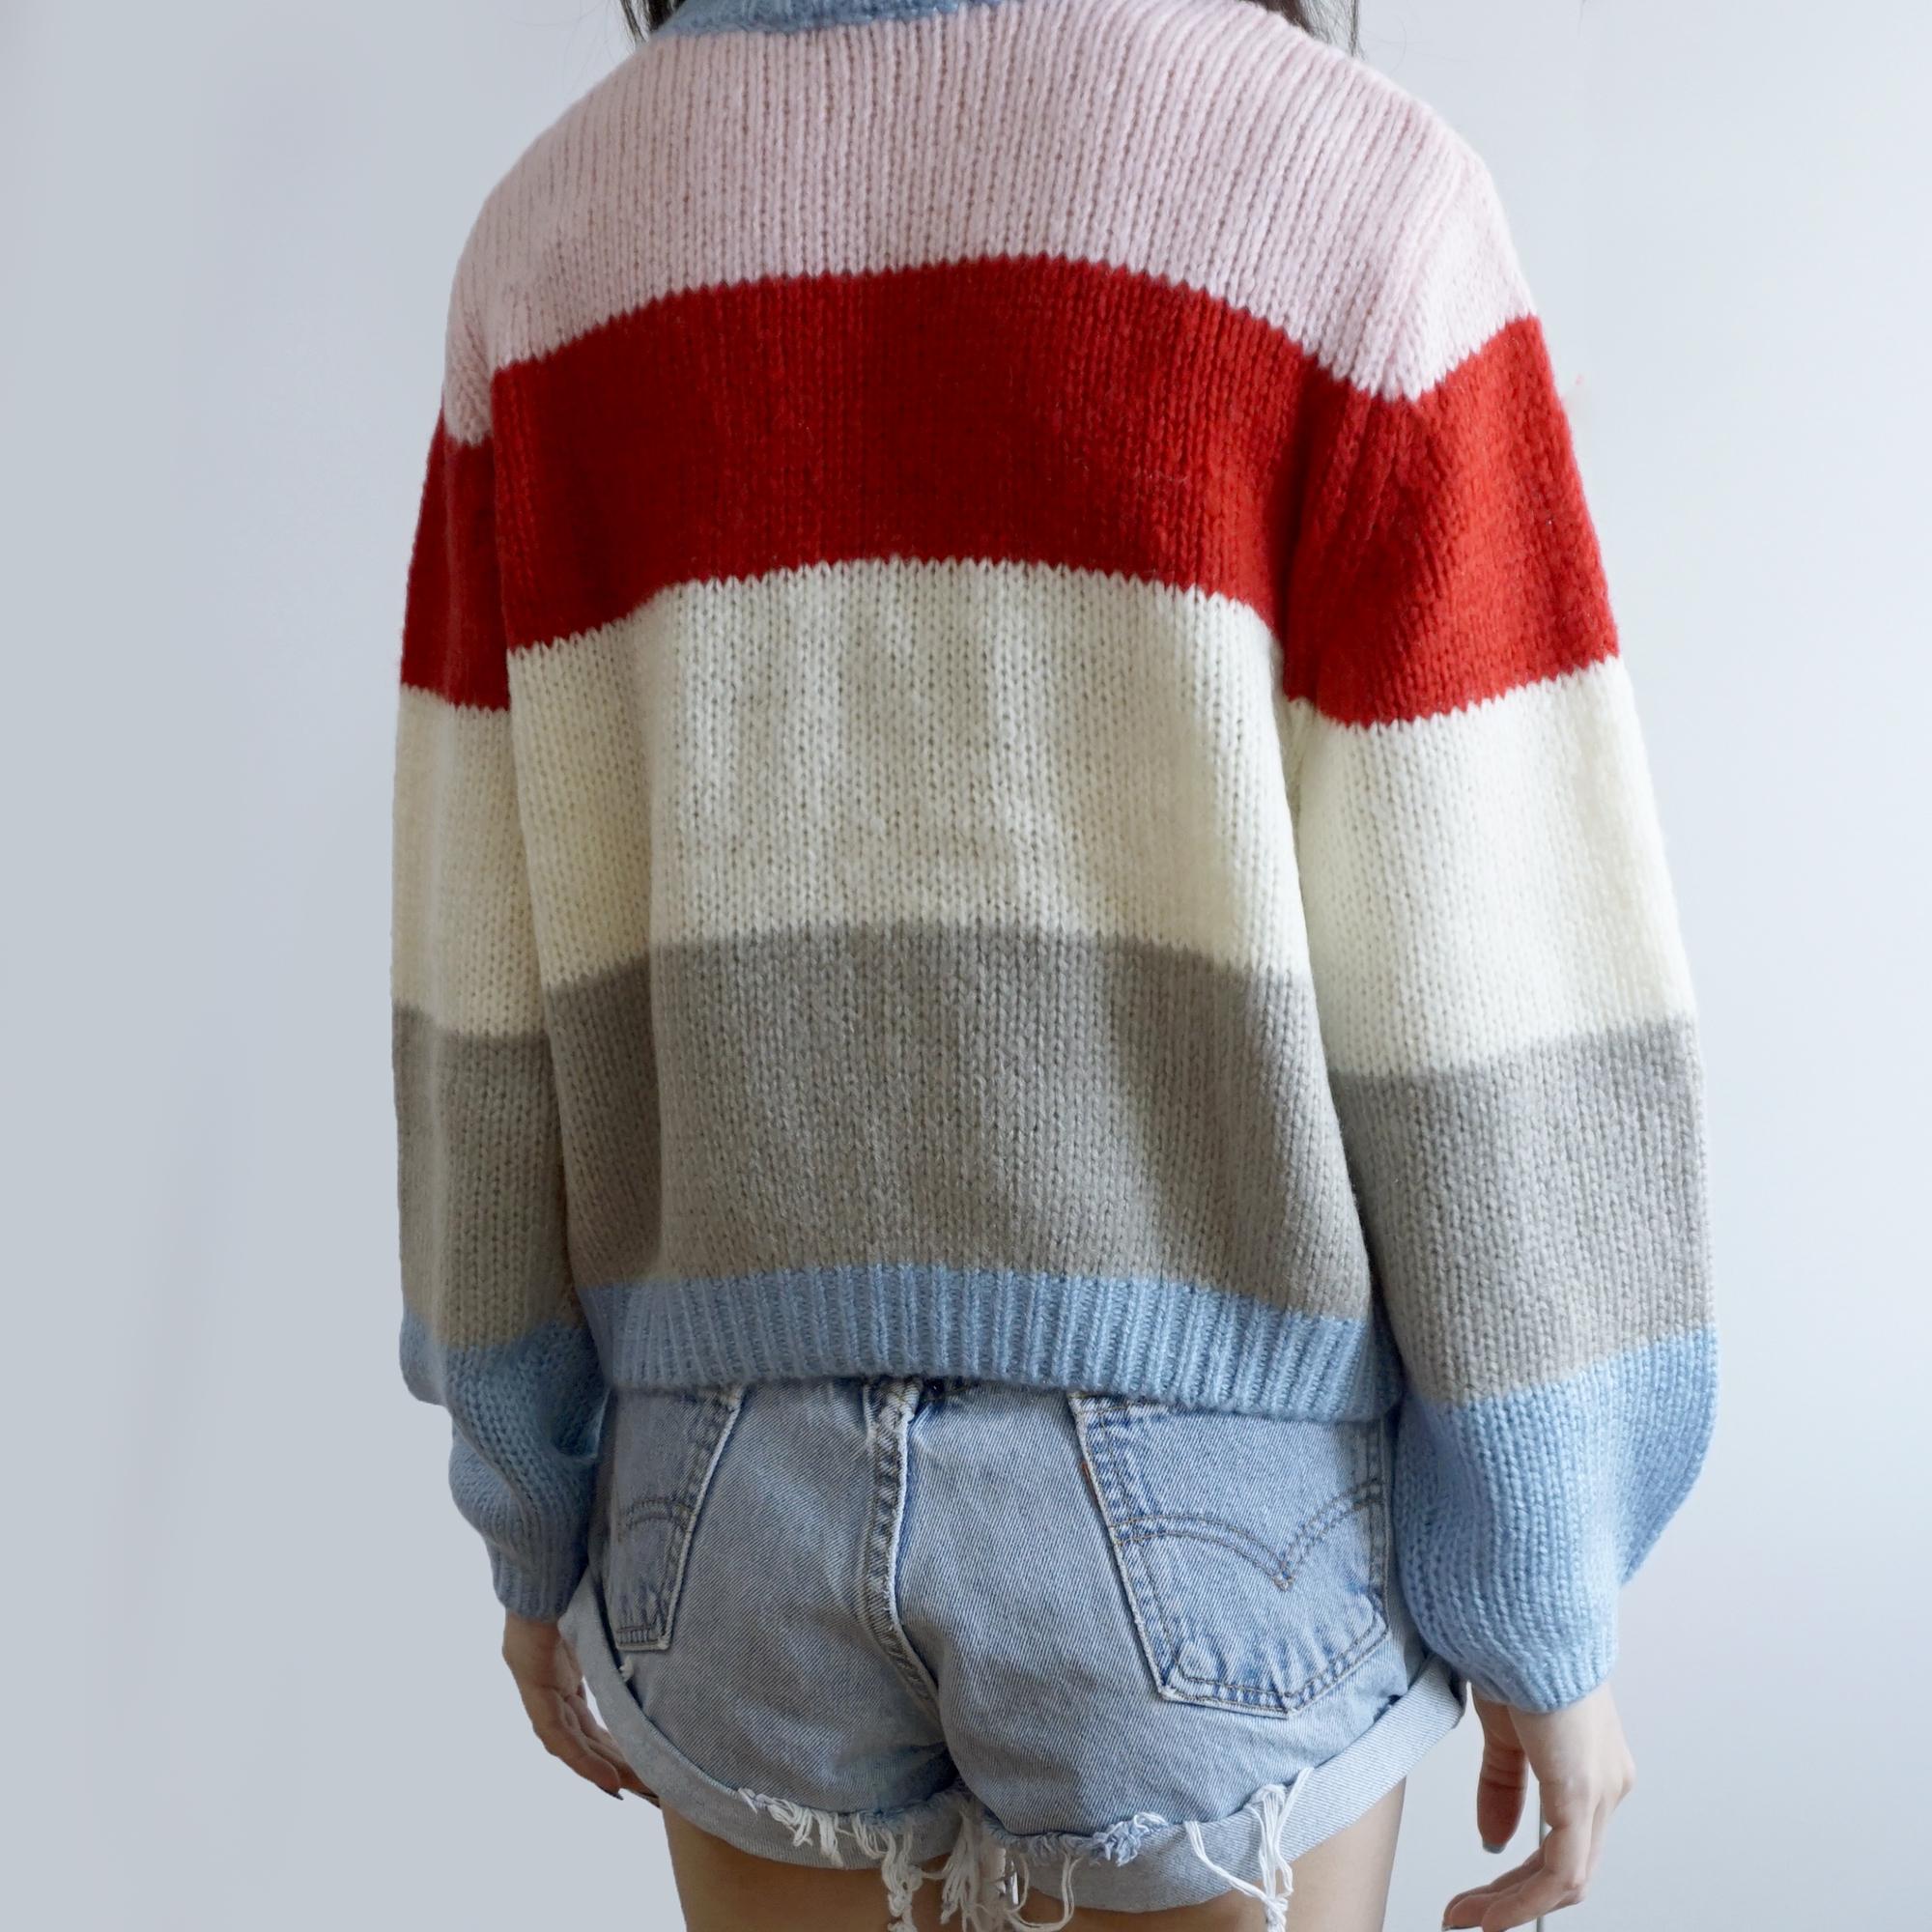 c3559e3516371f Colorblock Stripe Sweater (Pink Blue) · Megoosta Fashion · Free ...